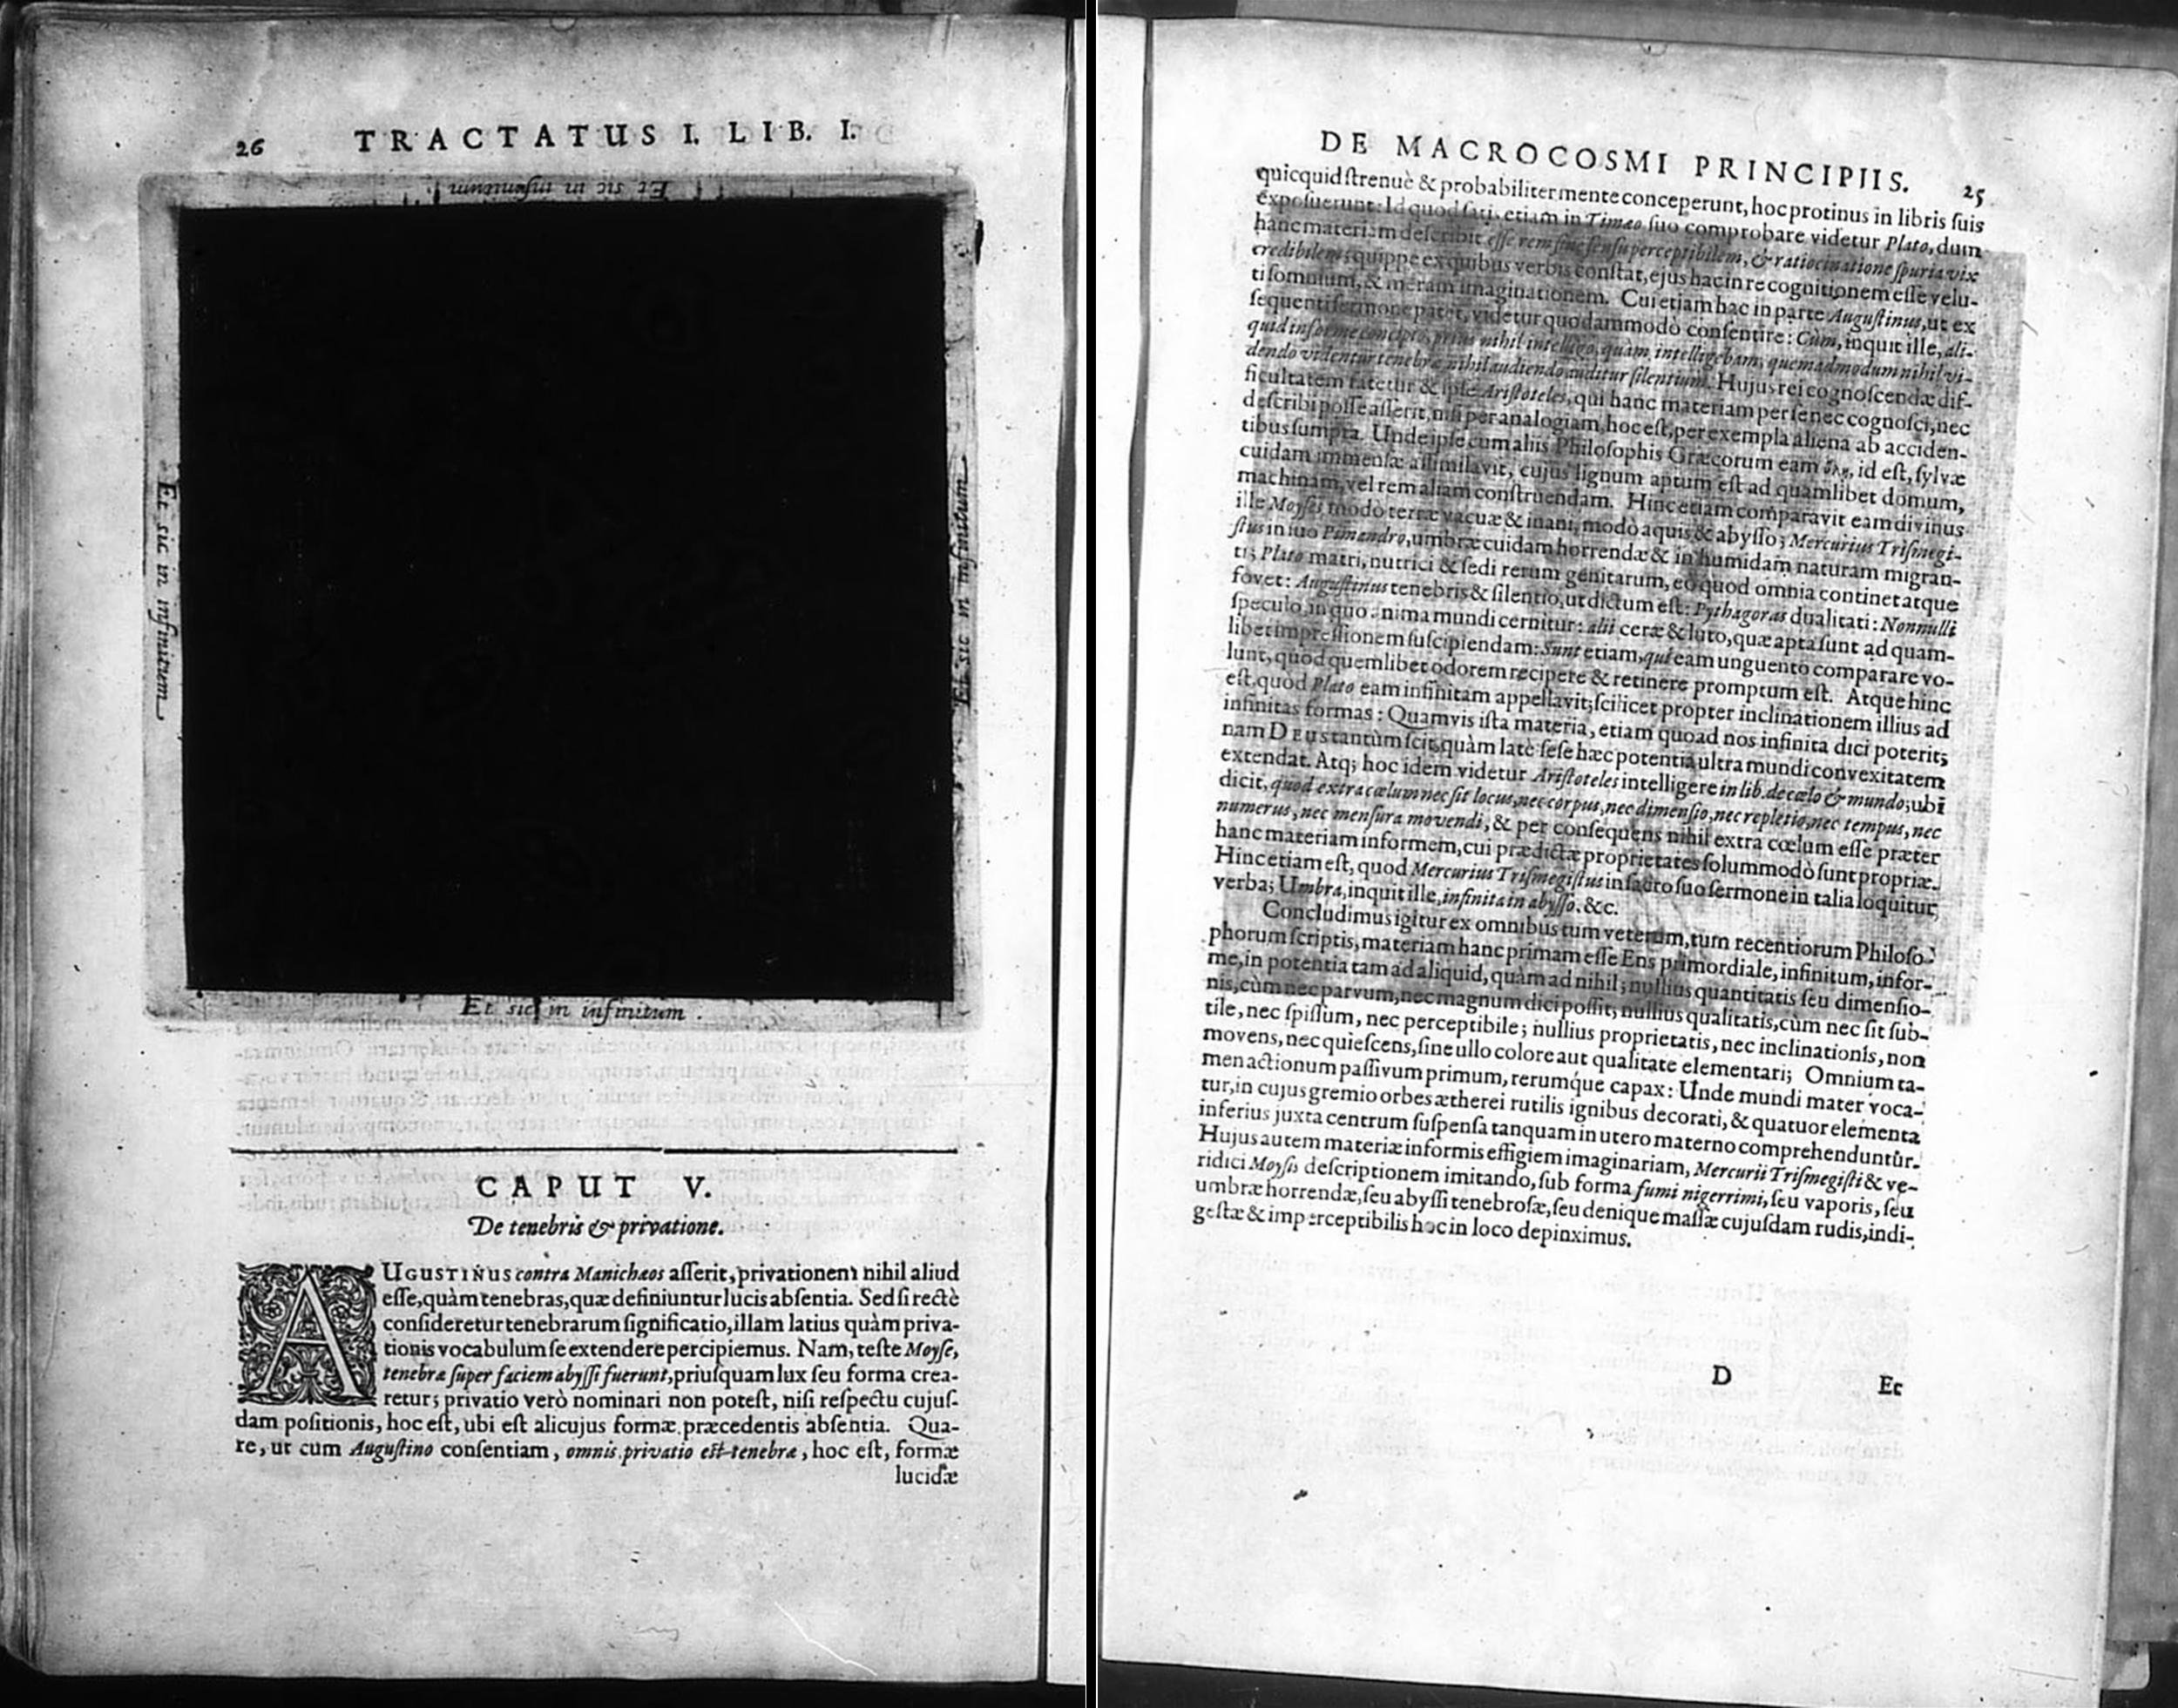 Bancroft Library UC Berkeley. Page 26 (verso) - Page 25 (recto)